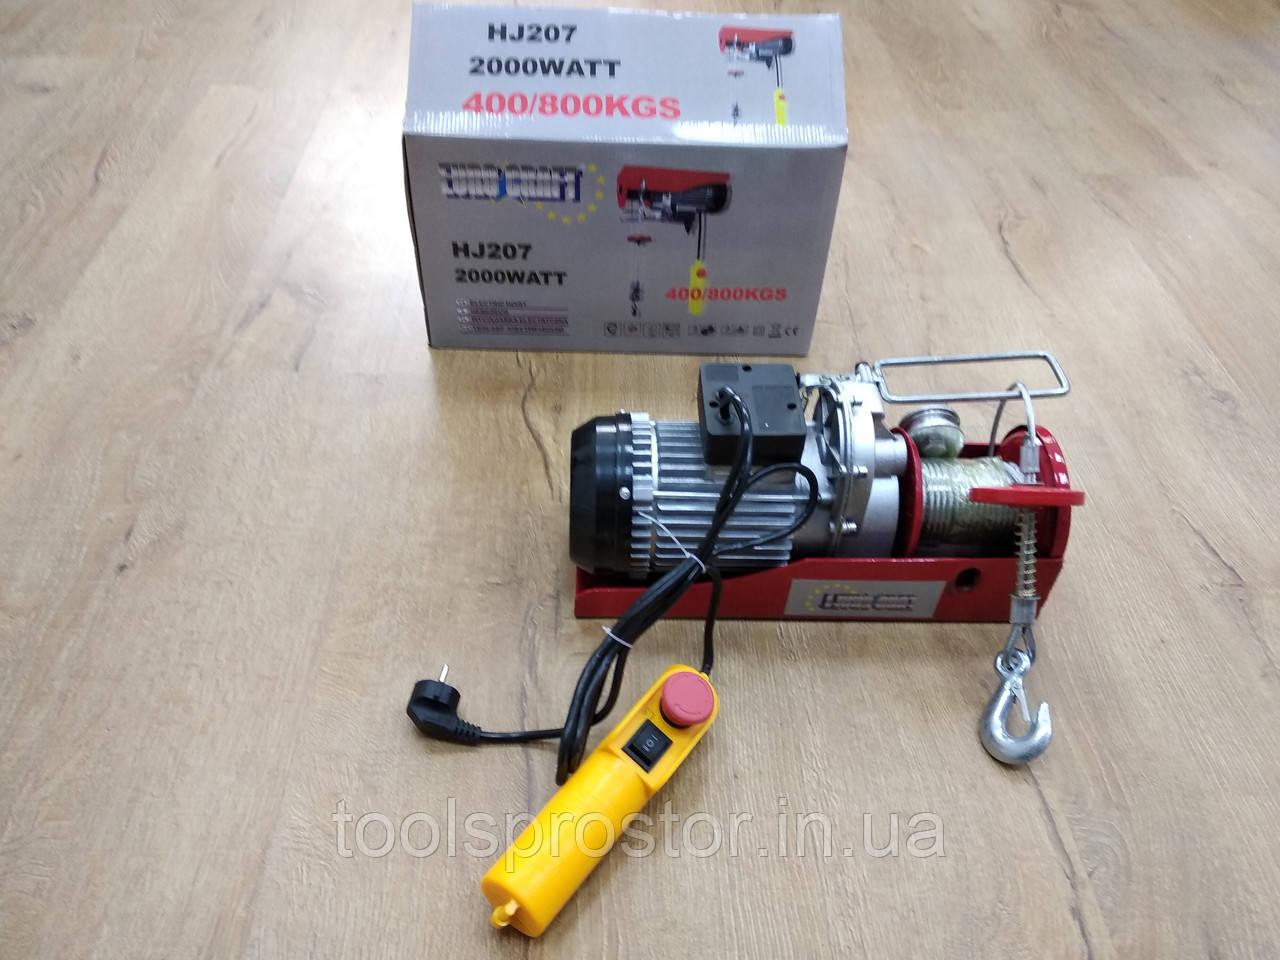 Тельфер Euro Craft HJ207 : 2 кВт   400/800kg